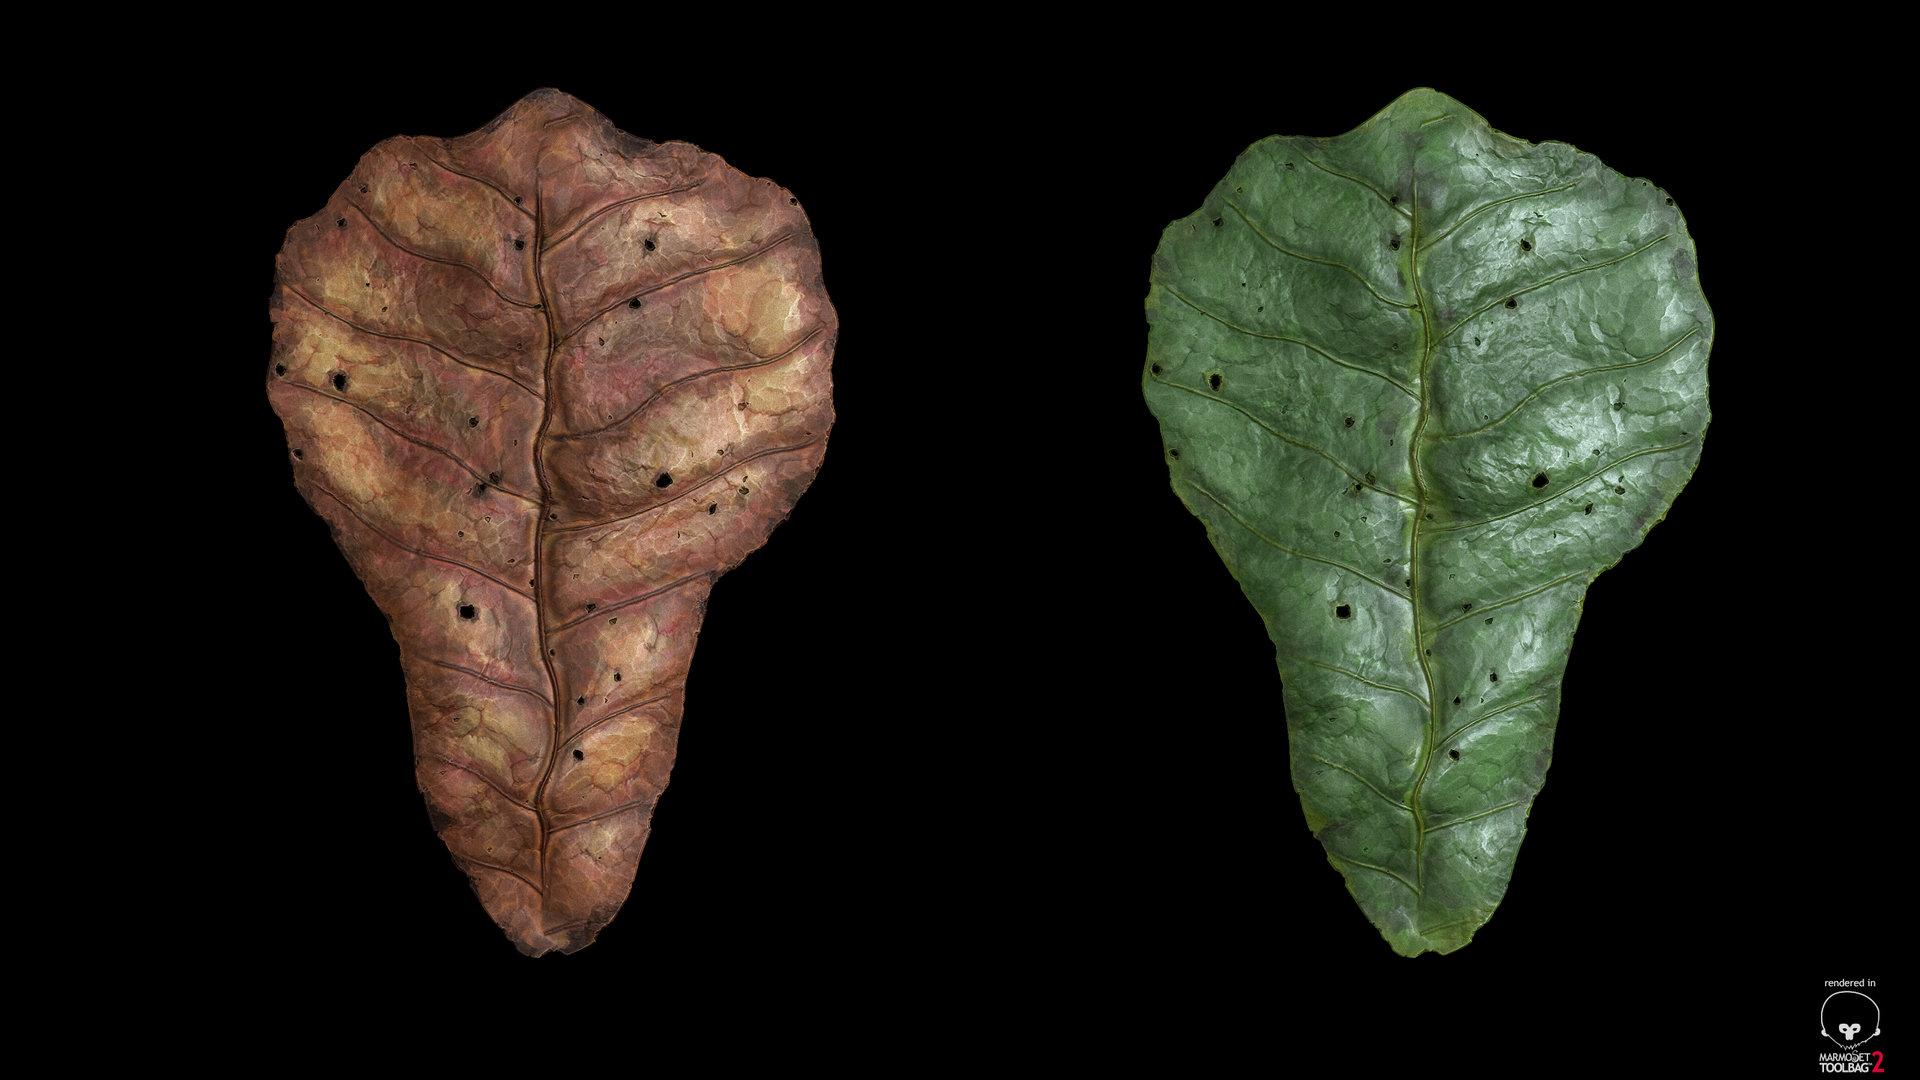 sebastian-schade-leaf3.jpg?1436909619